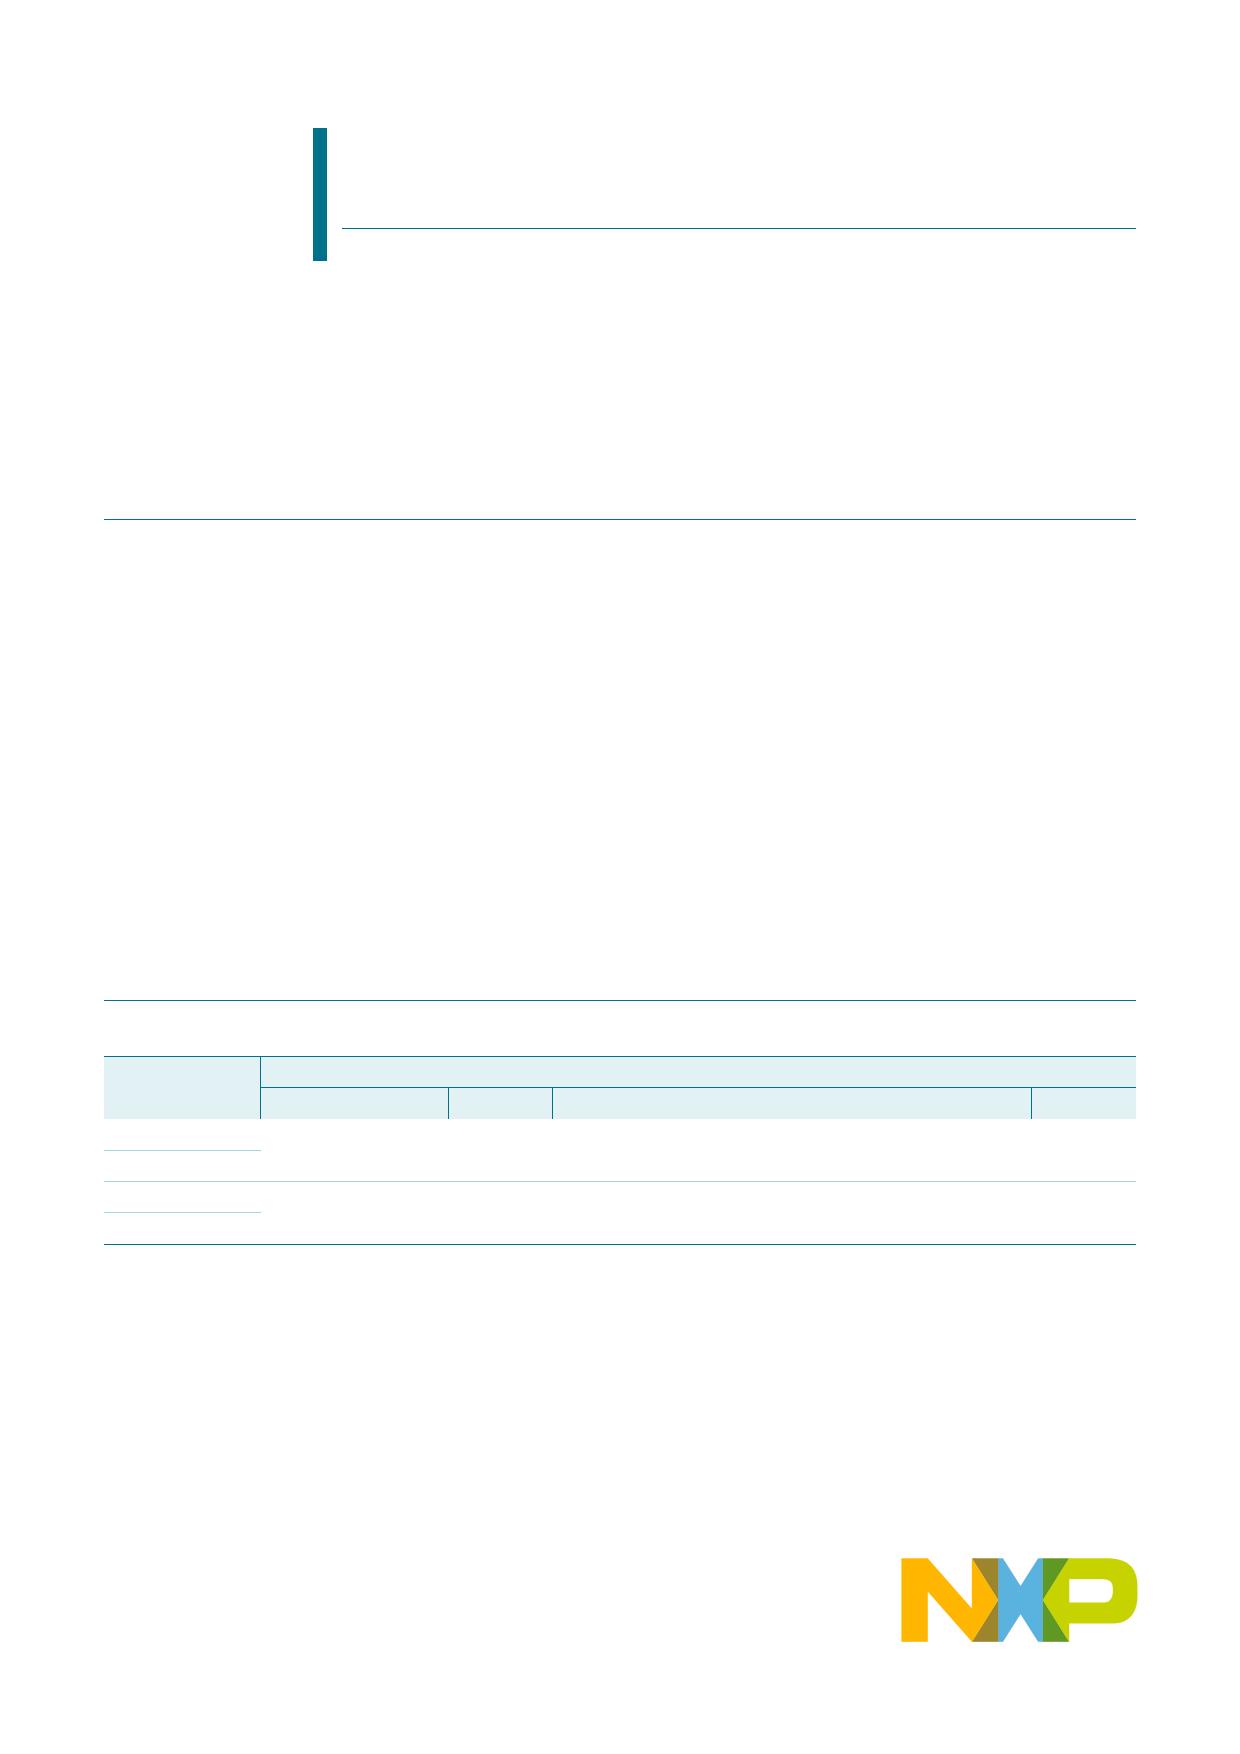 74HC1G04GW datasheet